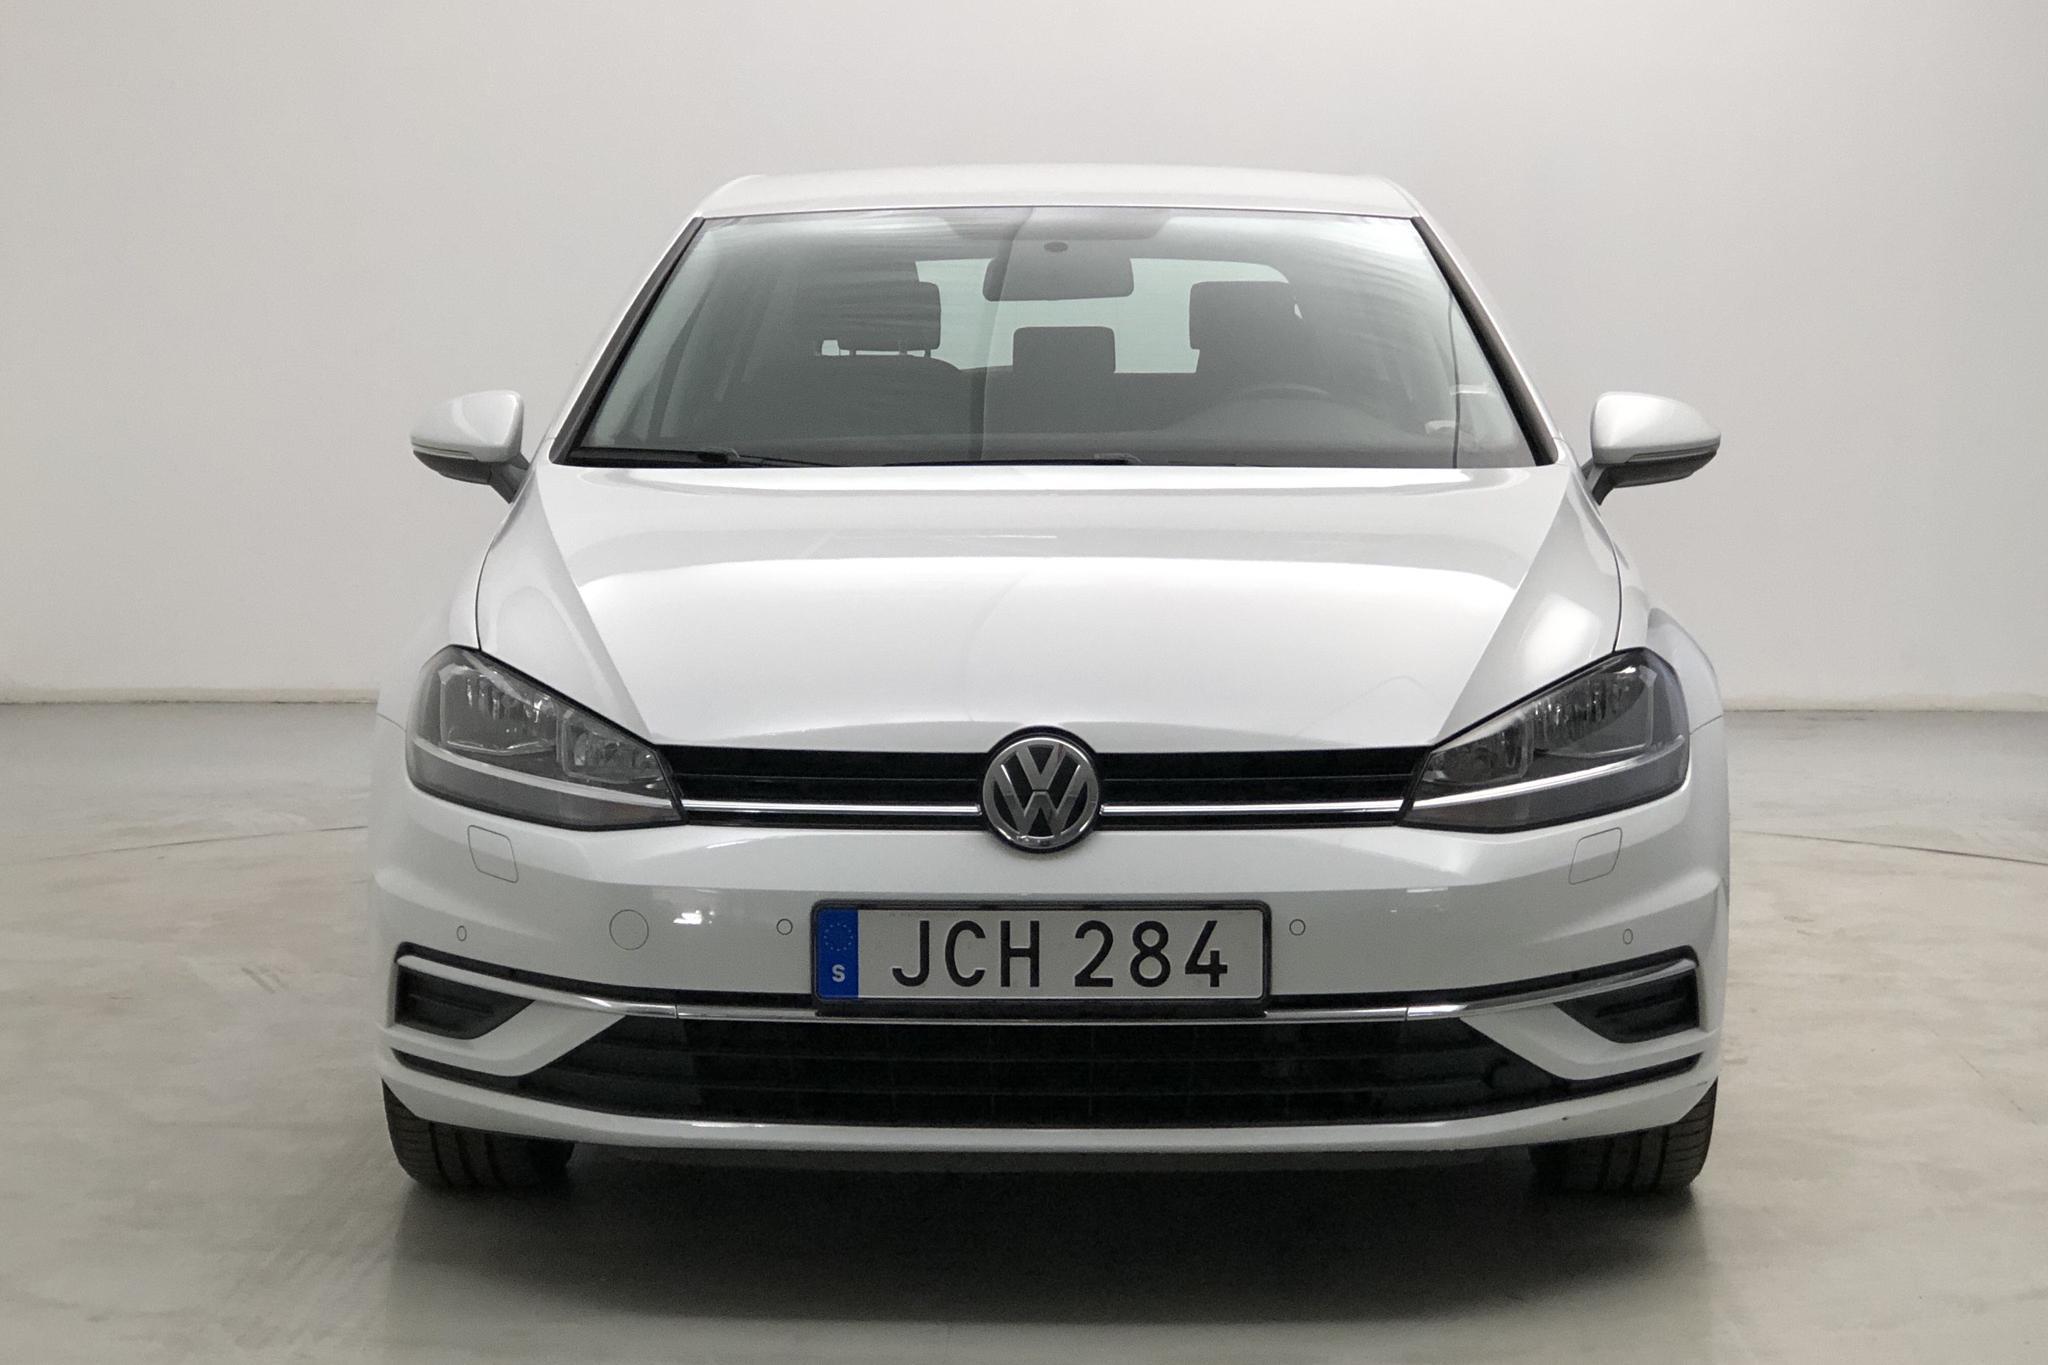 VW Golf VII 1.4 TSI Multifuel 5dr (125hk) - 34 140 km - Manual - white - 2017